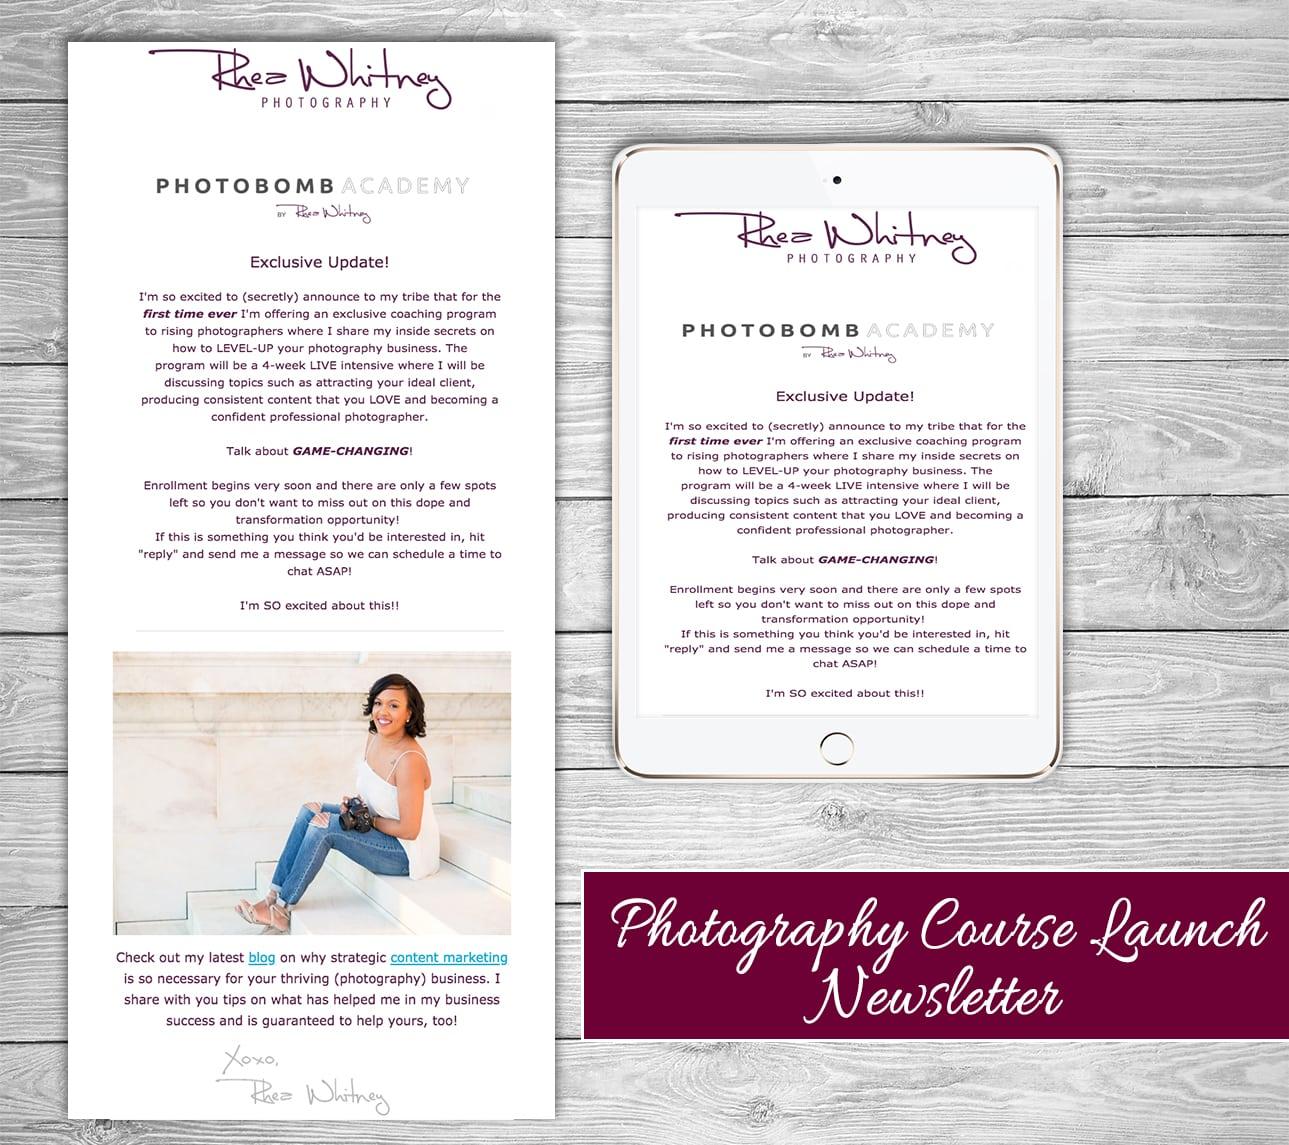 RheaWhitney_Photobomb_Academy_Course_Launch_Newsletter